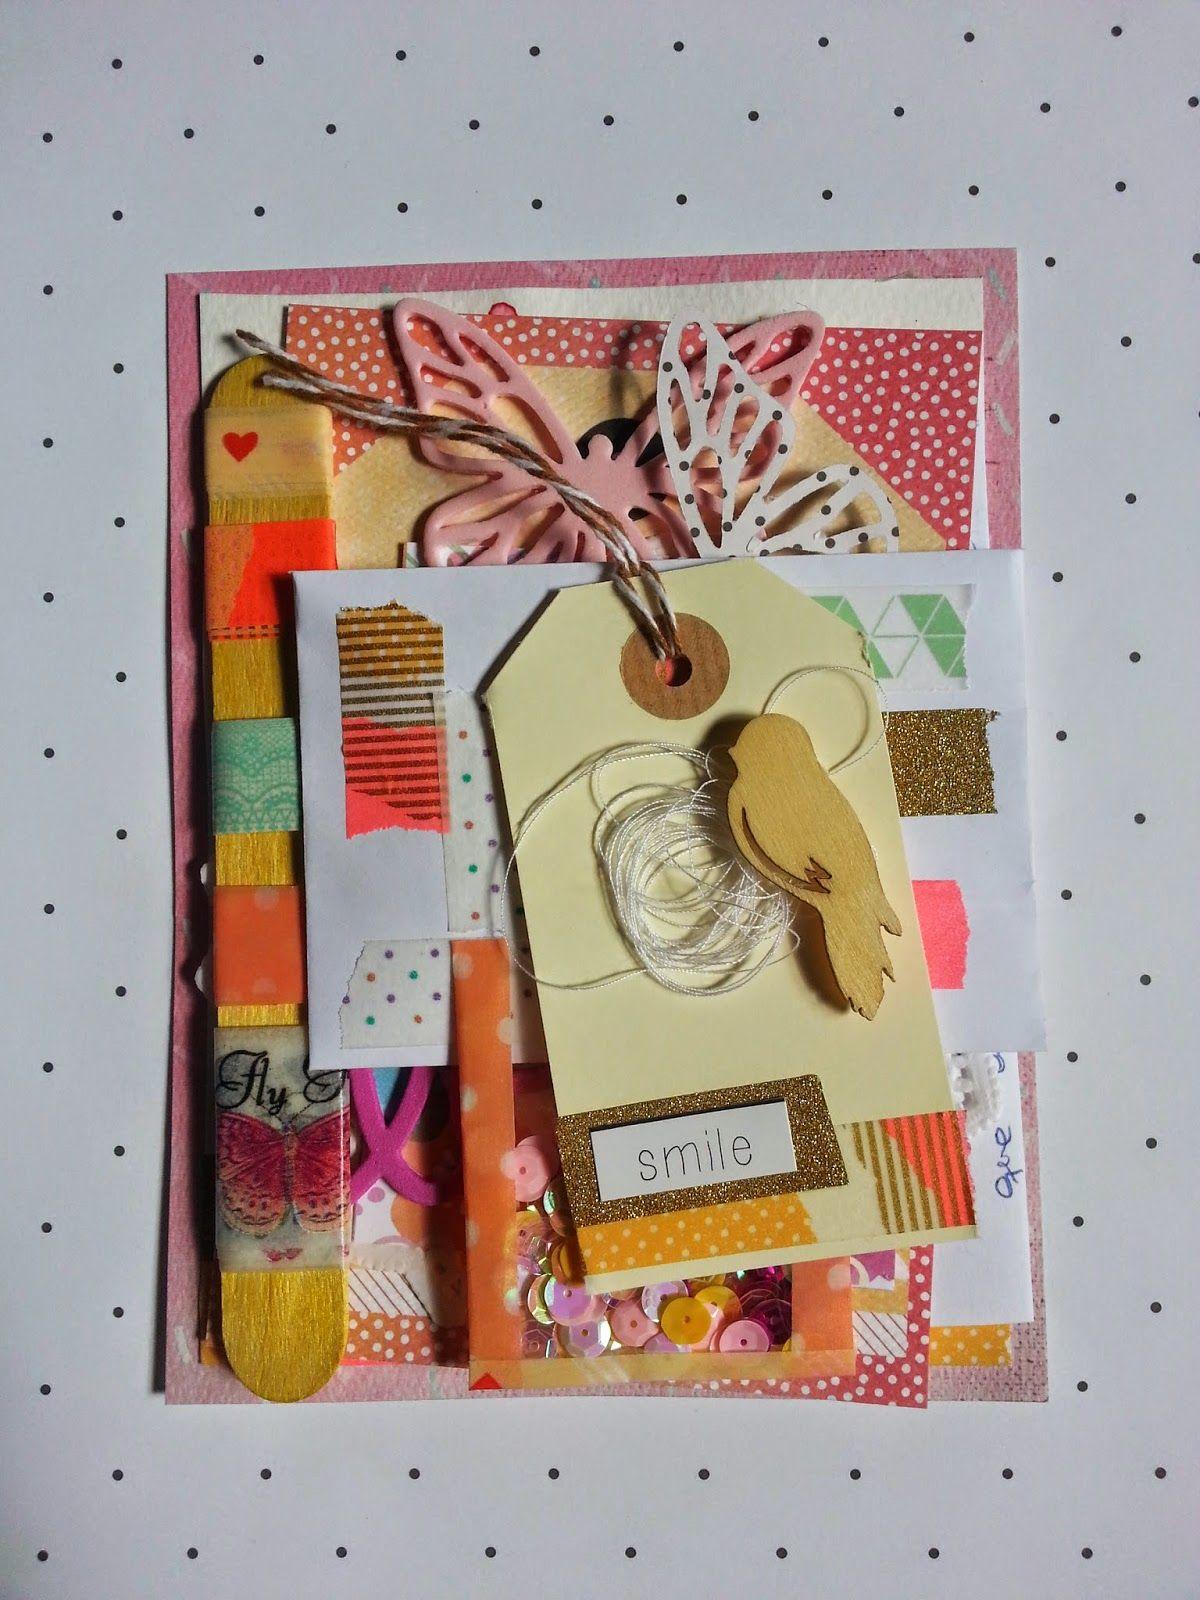 Diario de Loneta: correo primavera rosa